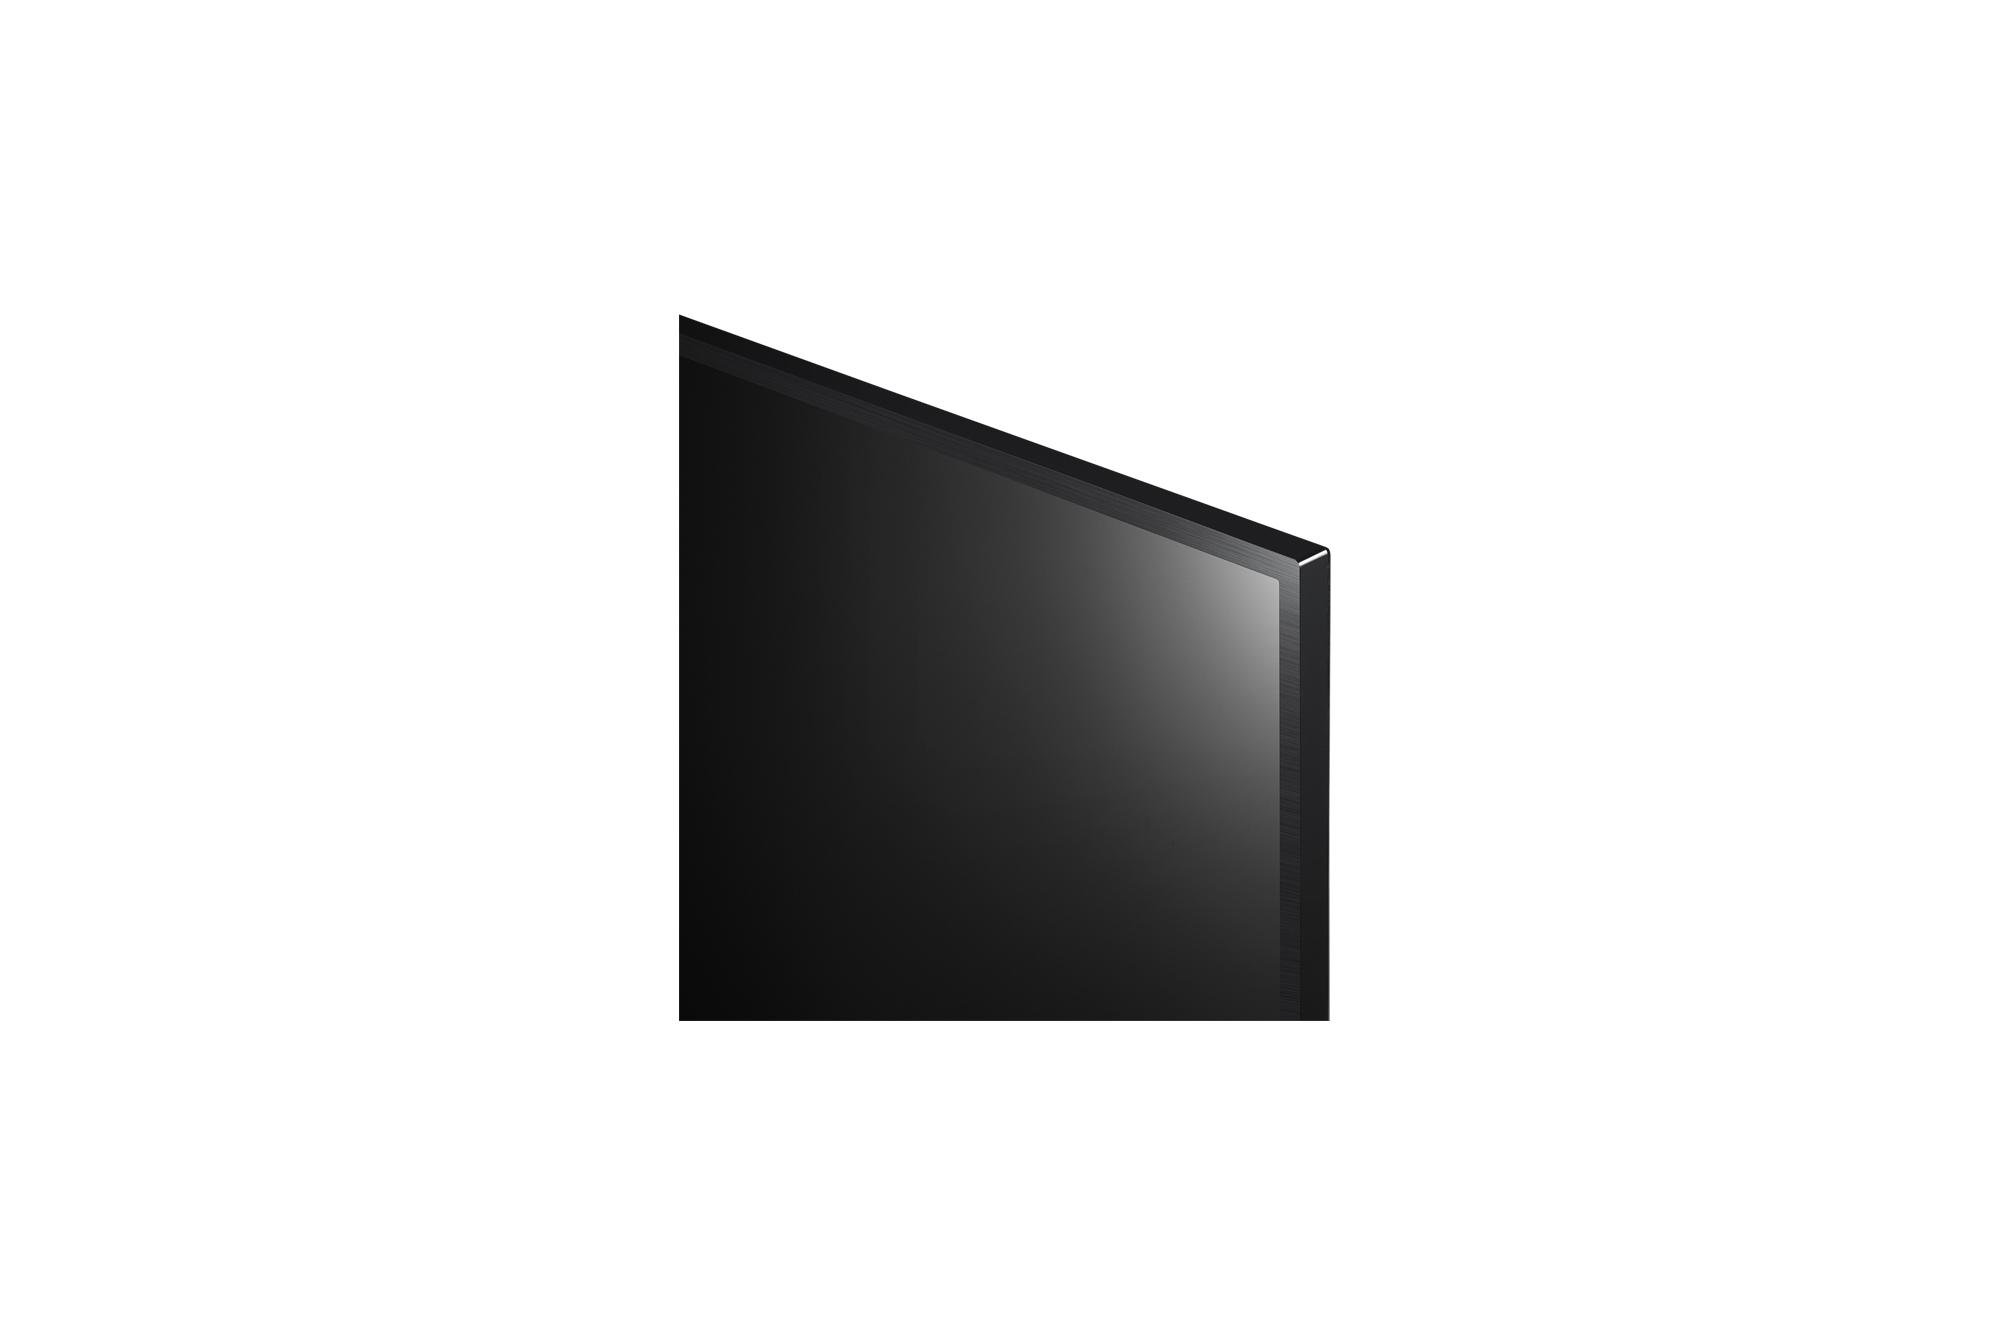 LG Hotel TV 50US662H (CIS) 11